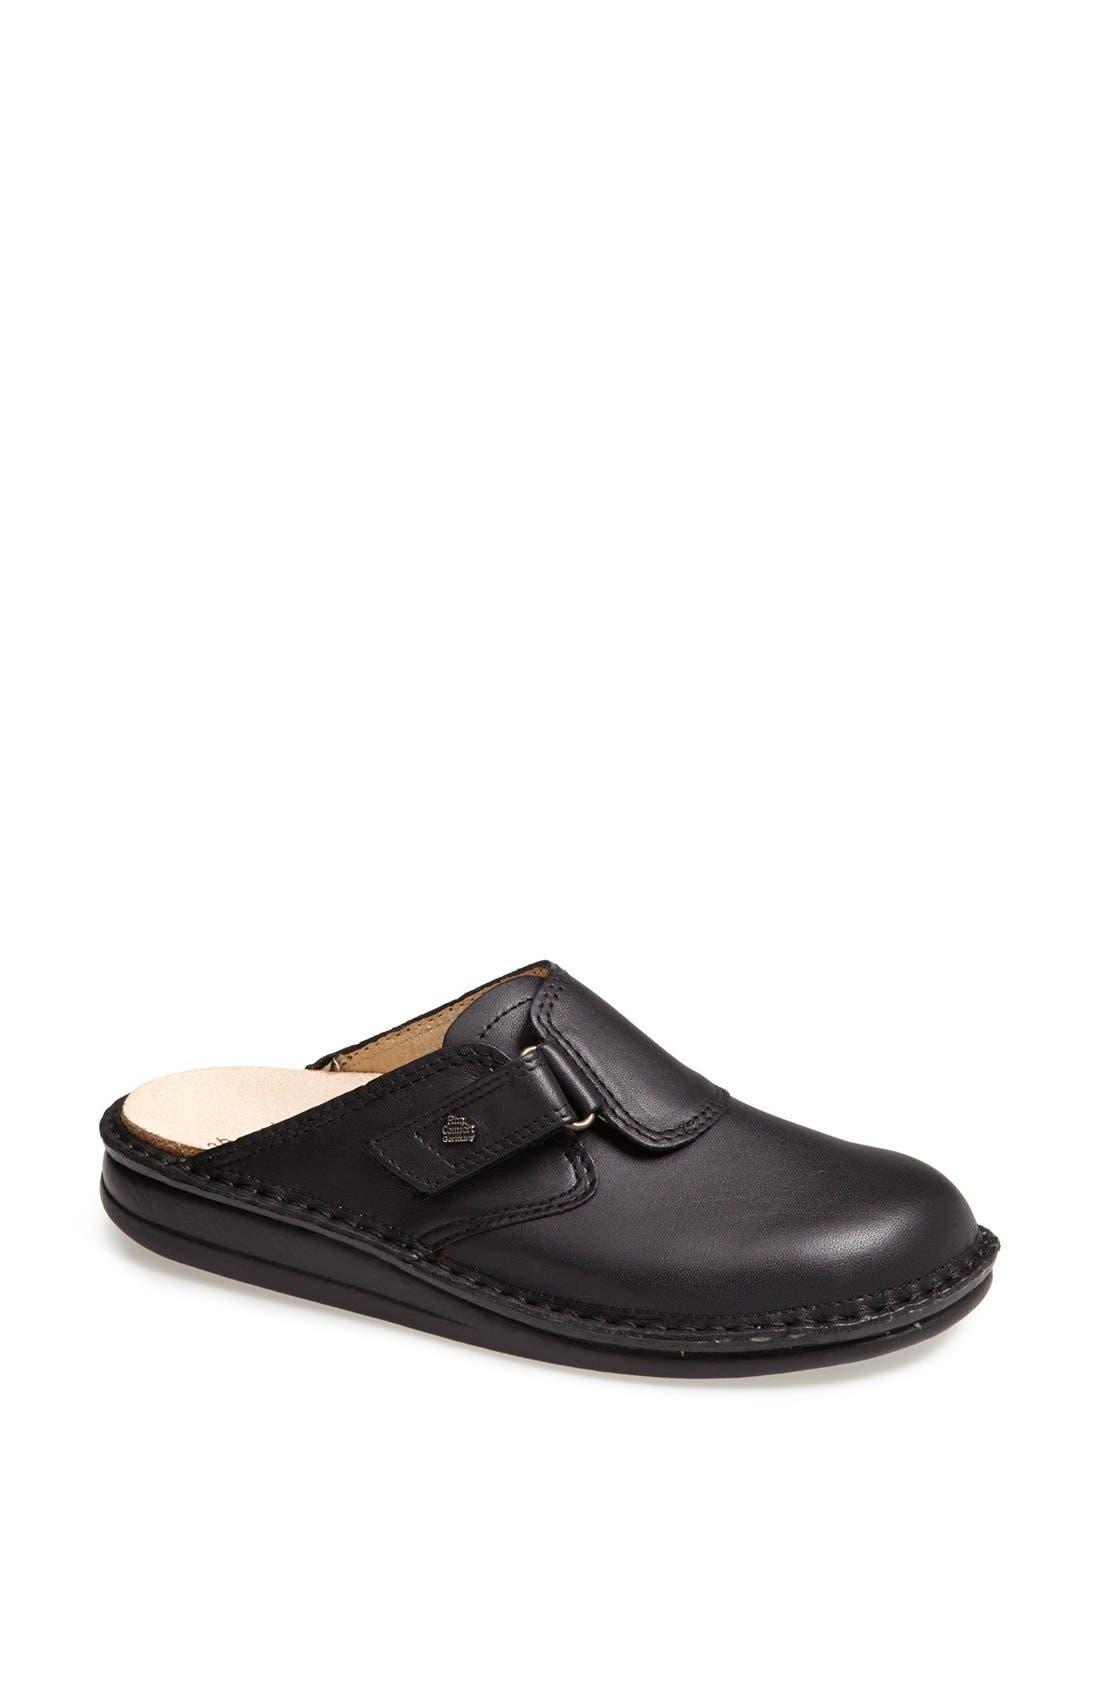 'Venice' Leather Clog,                         Main,                         color, 001